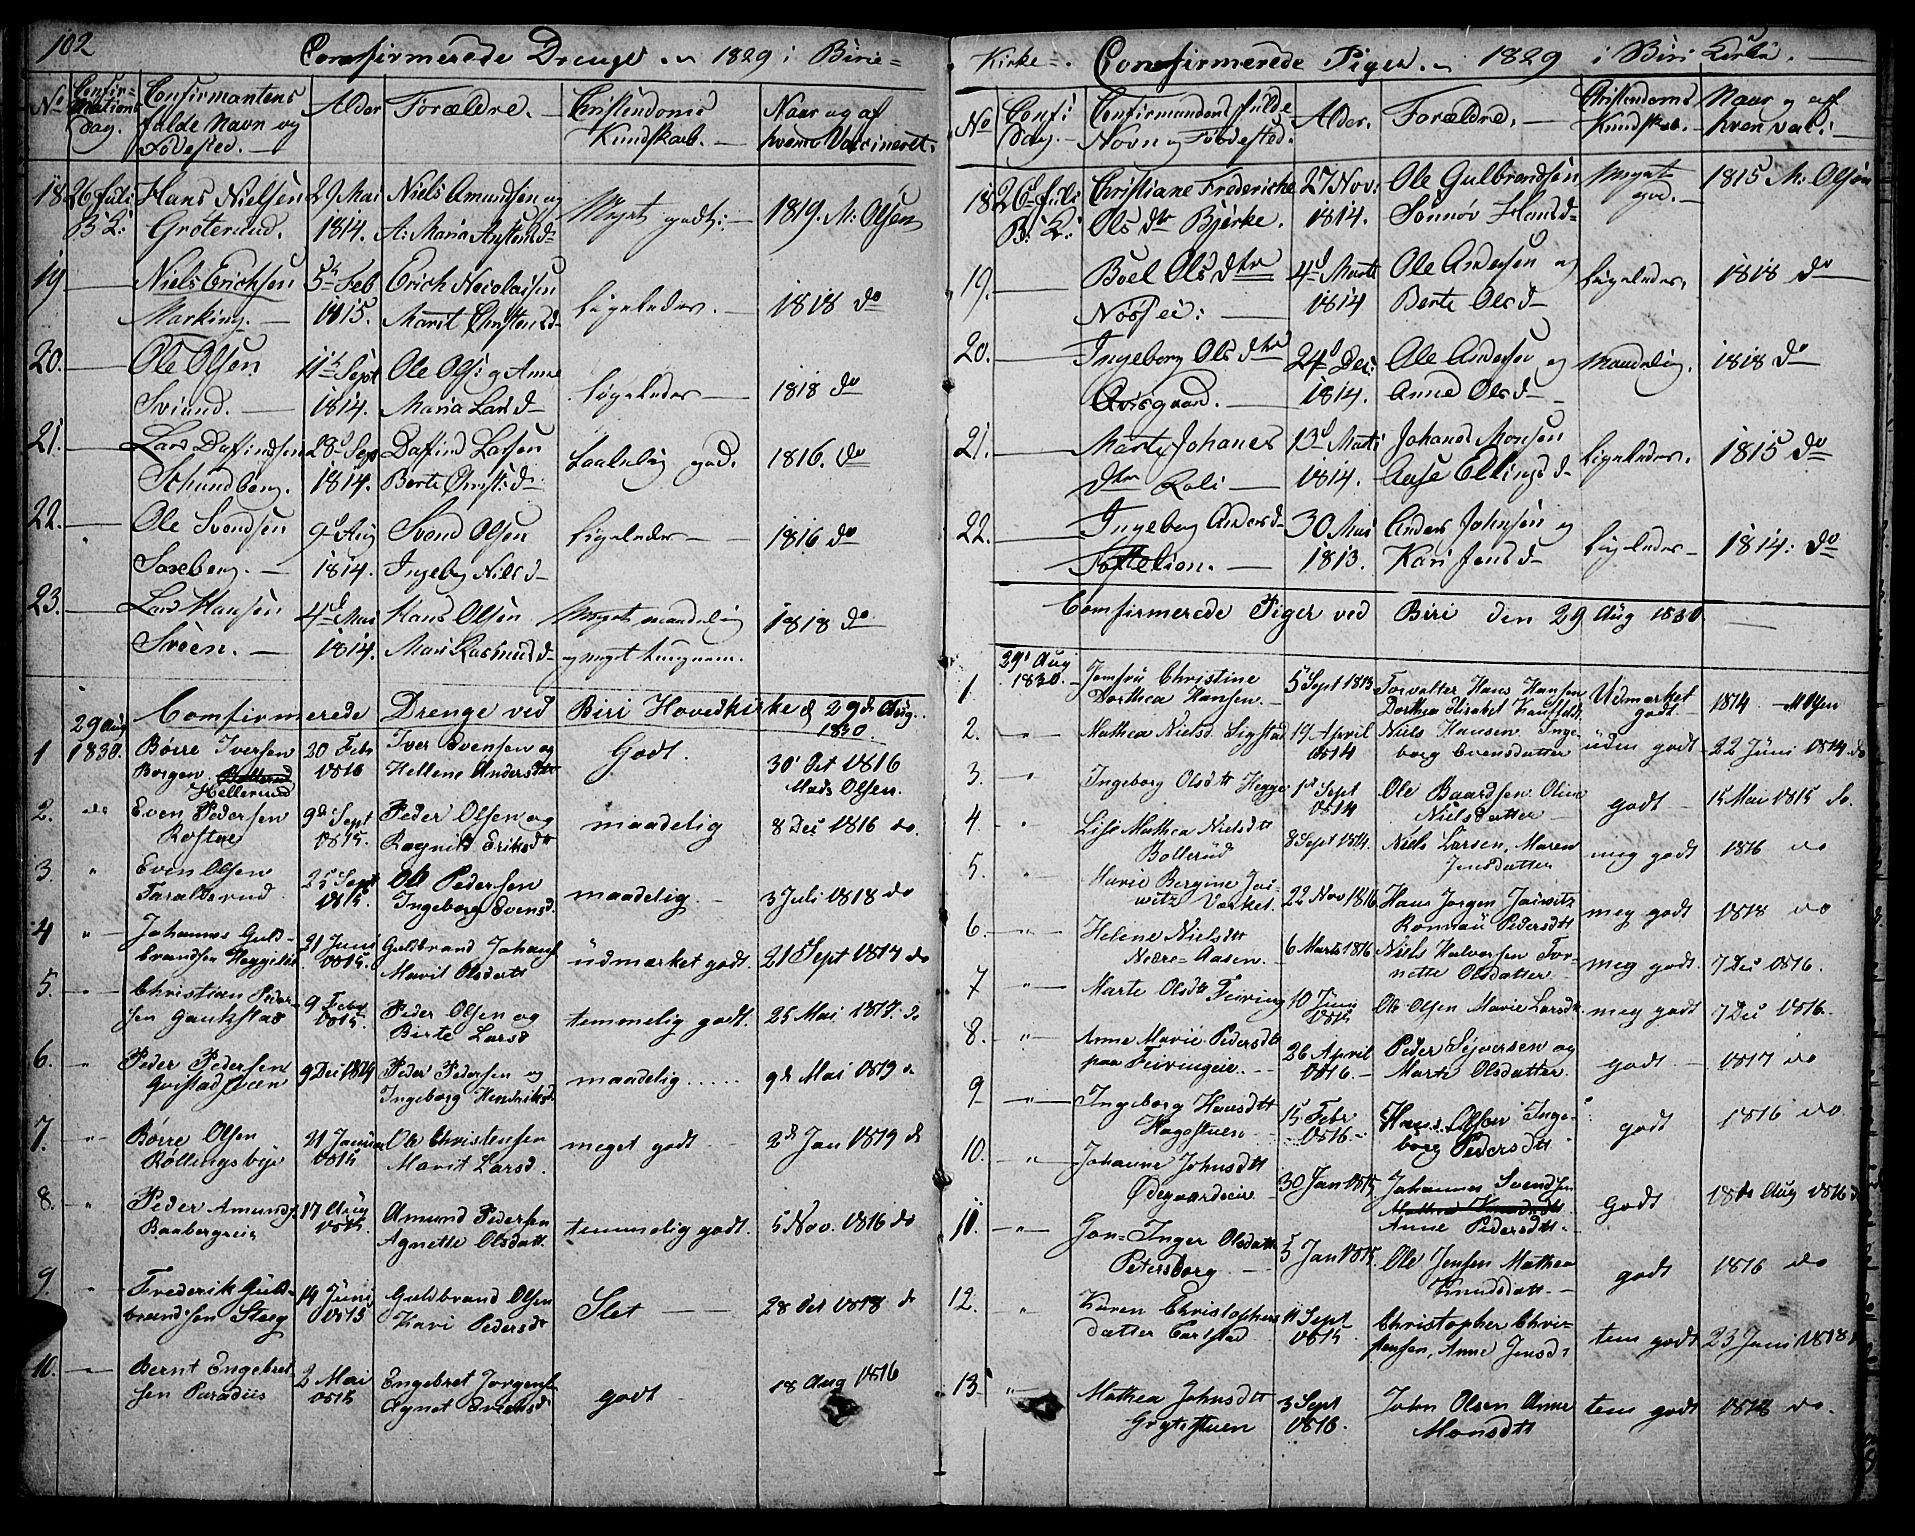 SAH, Biri prestekontor, Ministerialbok nr. 4, 1829-1842, s. 102